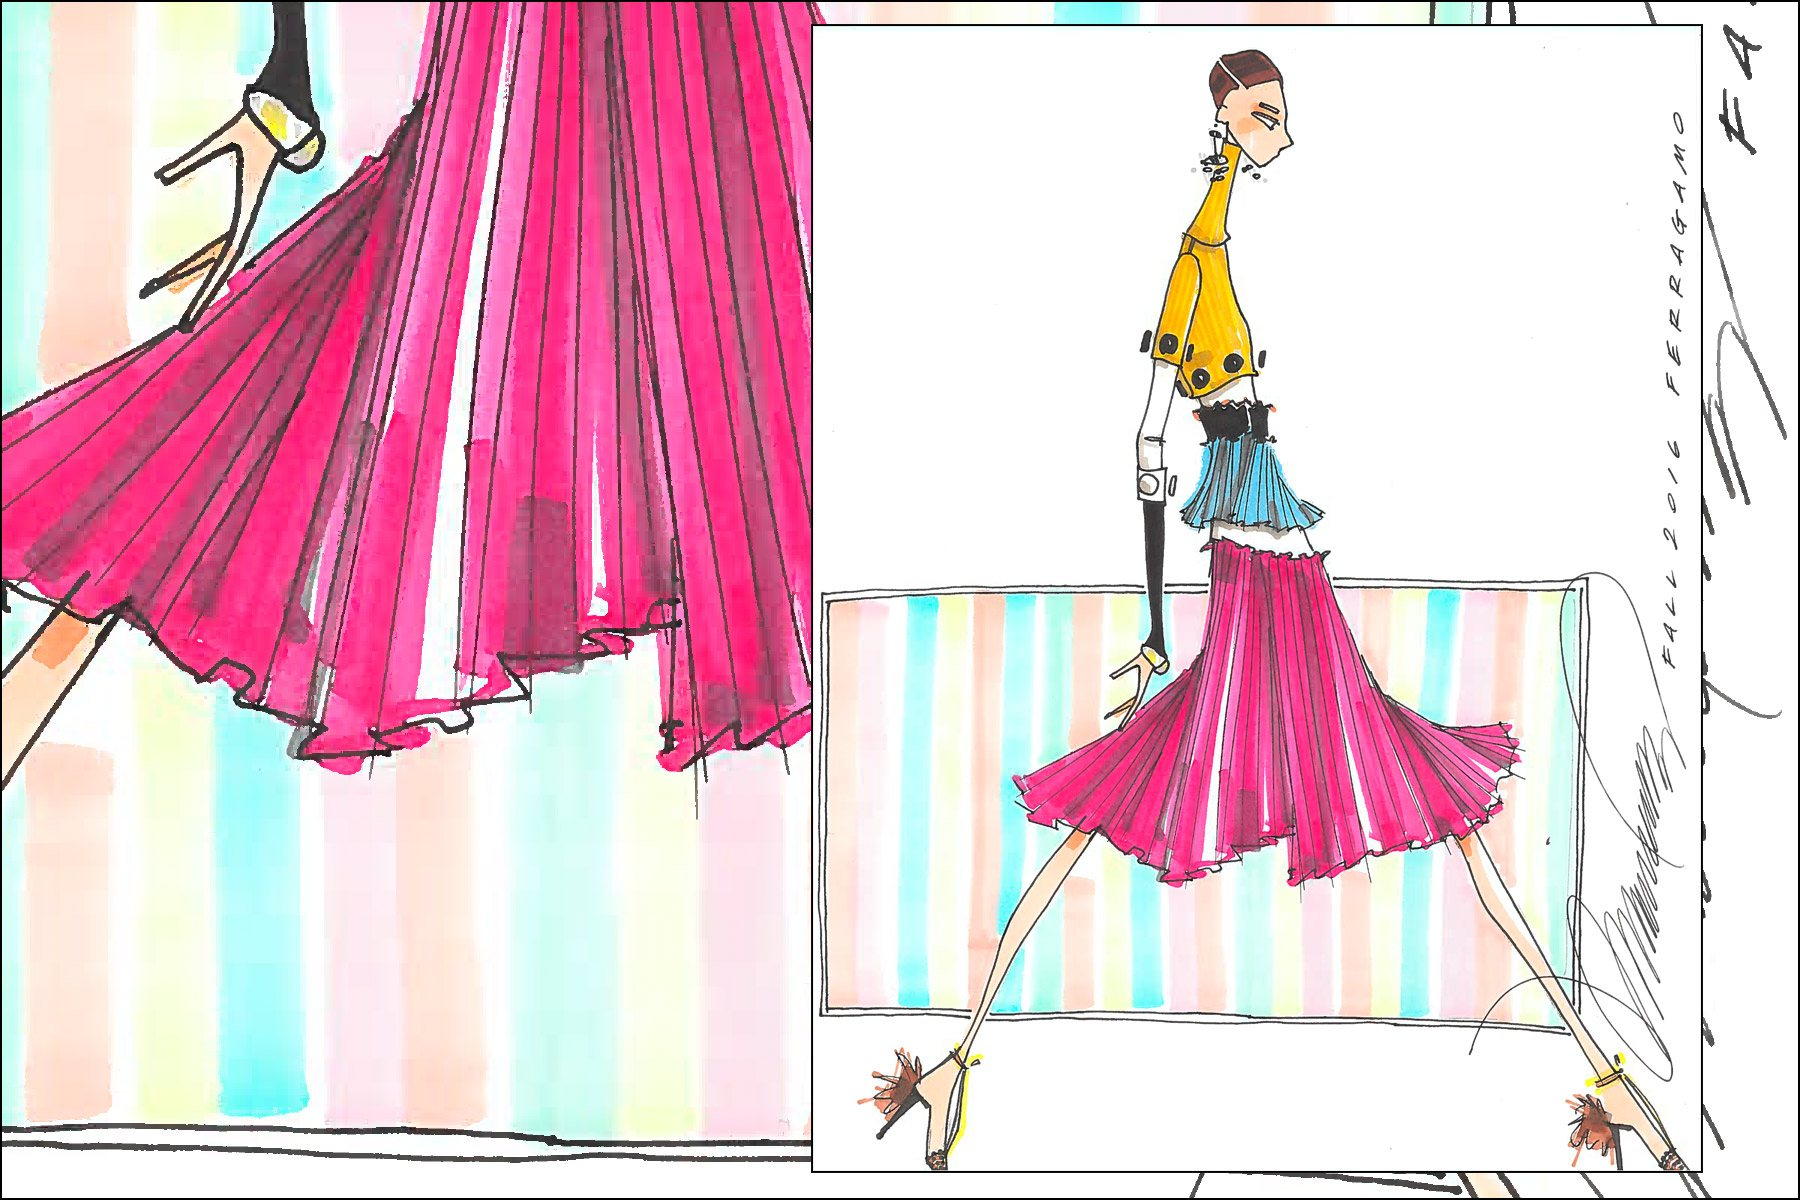 Fall 2016 Ferragamo fashion illustration by Michael Ward. Ponyboy magazine New York.